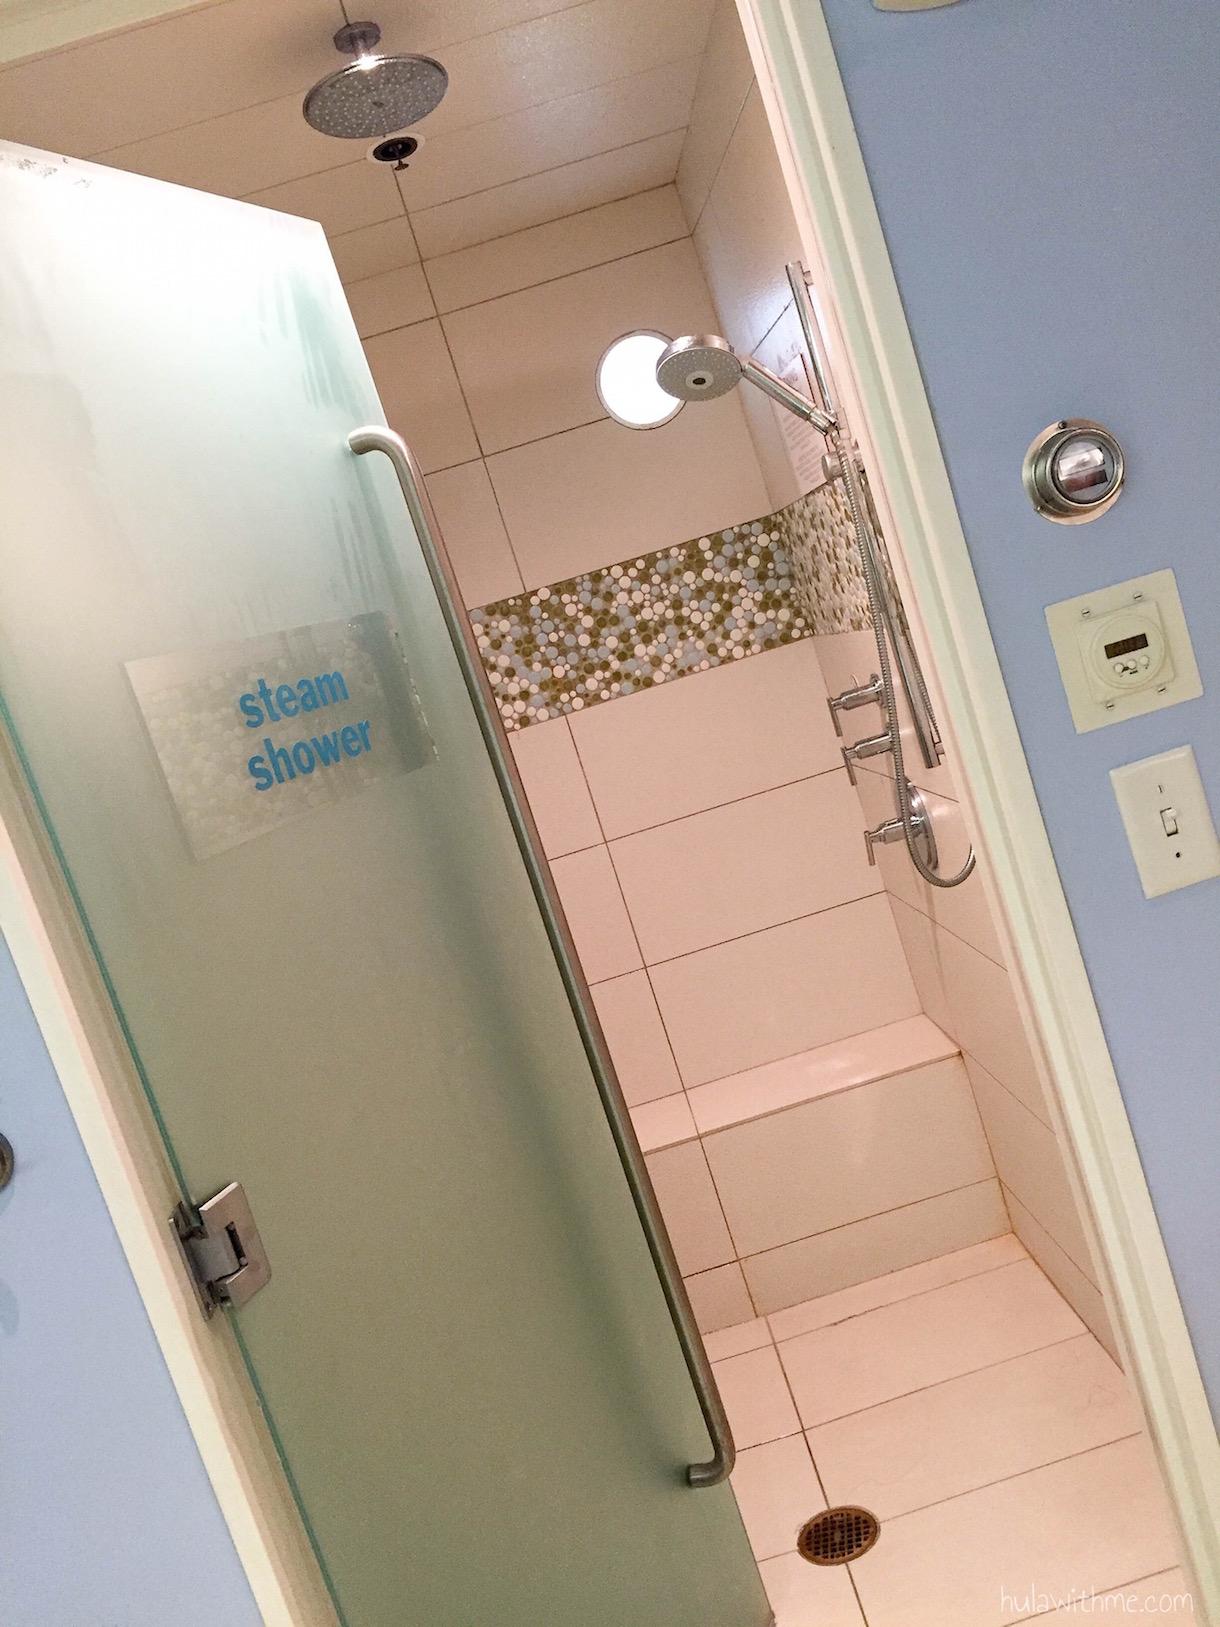 Bliss Spa in Boston, MA: The eucalyptus steam shower inside the ladies' locker room.